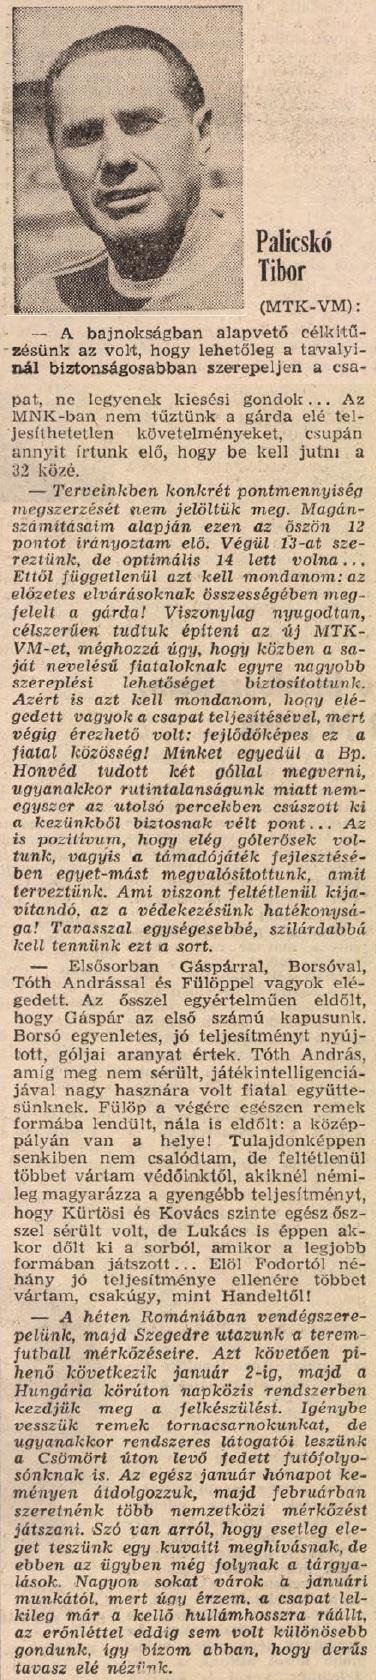 idokapszula_nb_i_1983_84_oszi_zaras_edzoi_gyorsmerleg_2_10_mtk_vm_palicsko_tibor.jpg